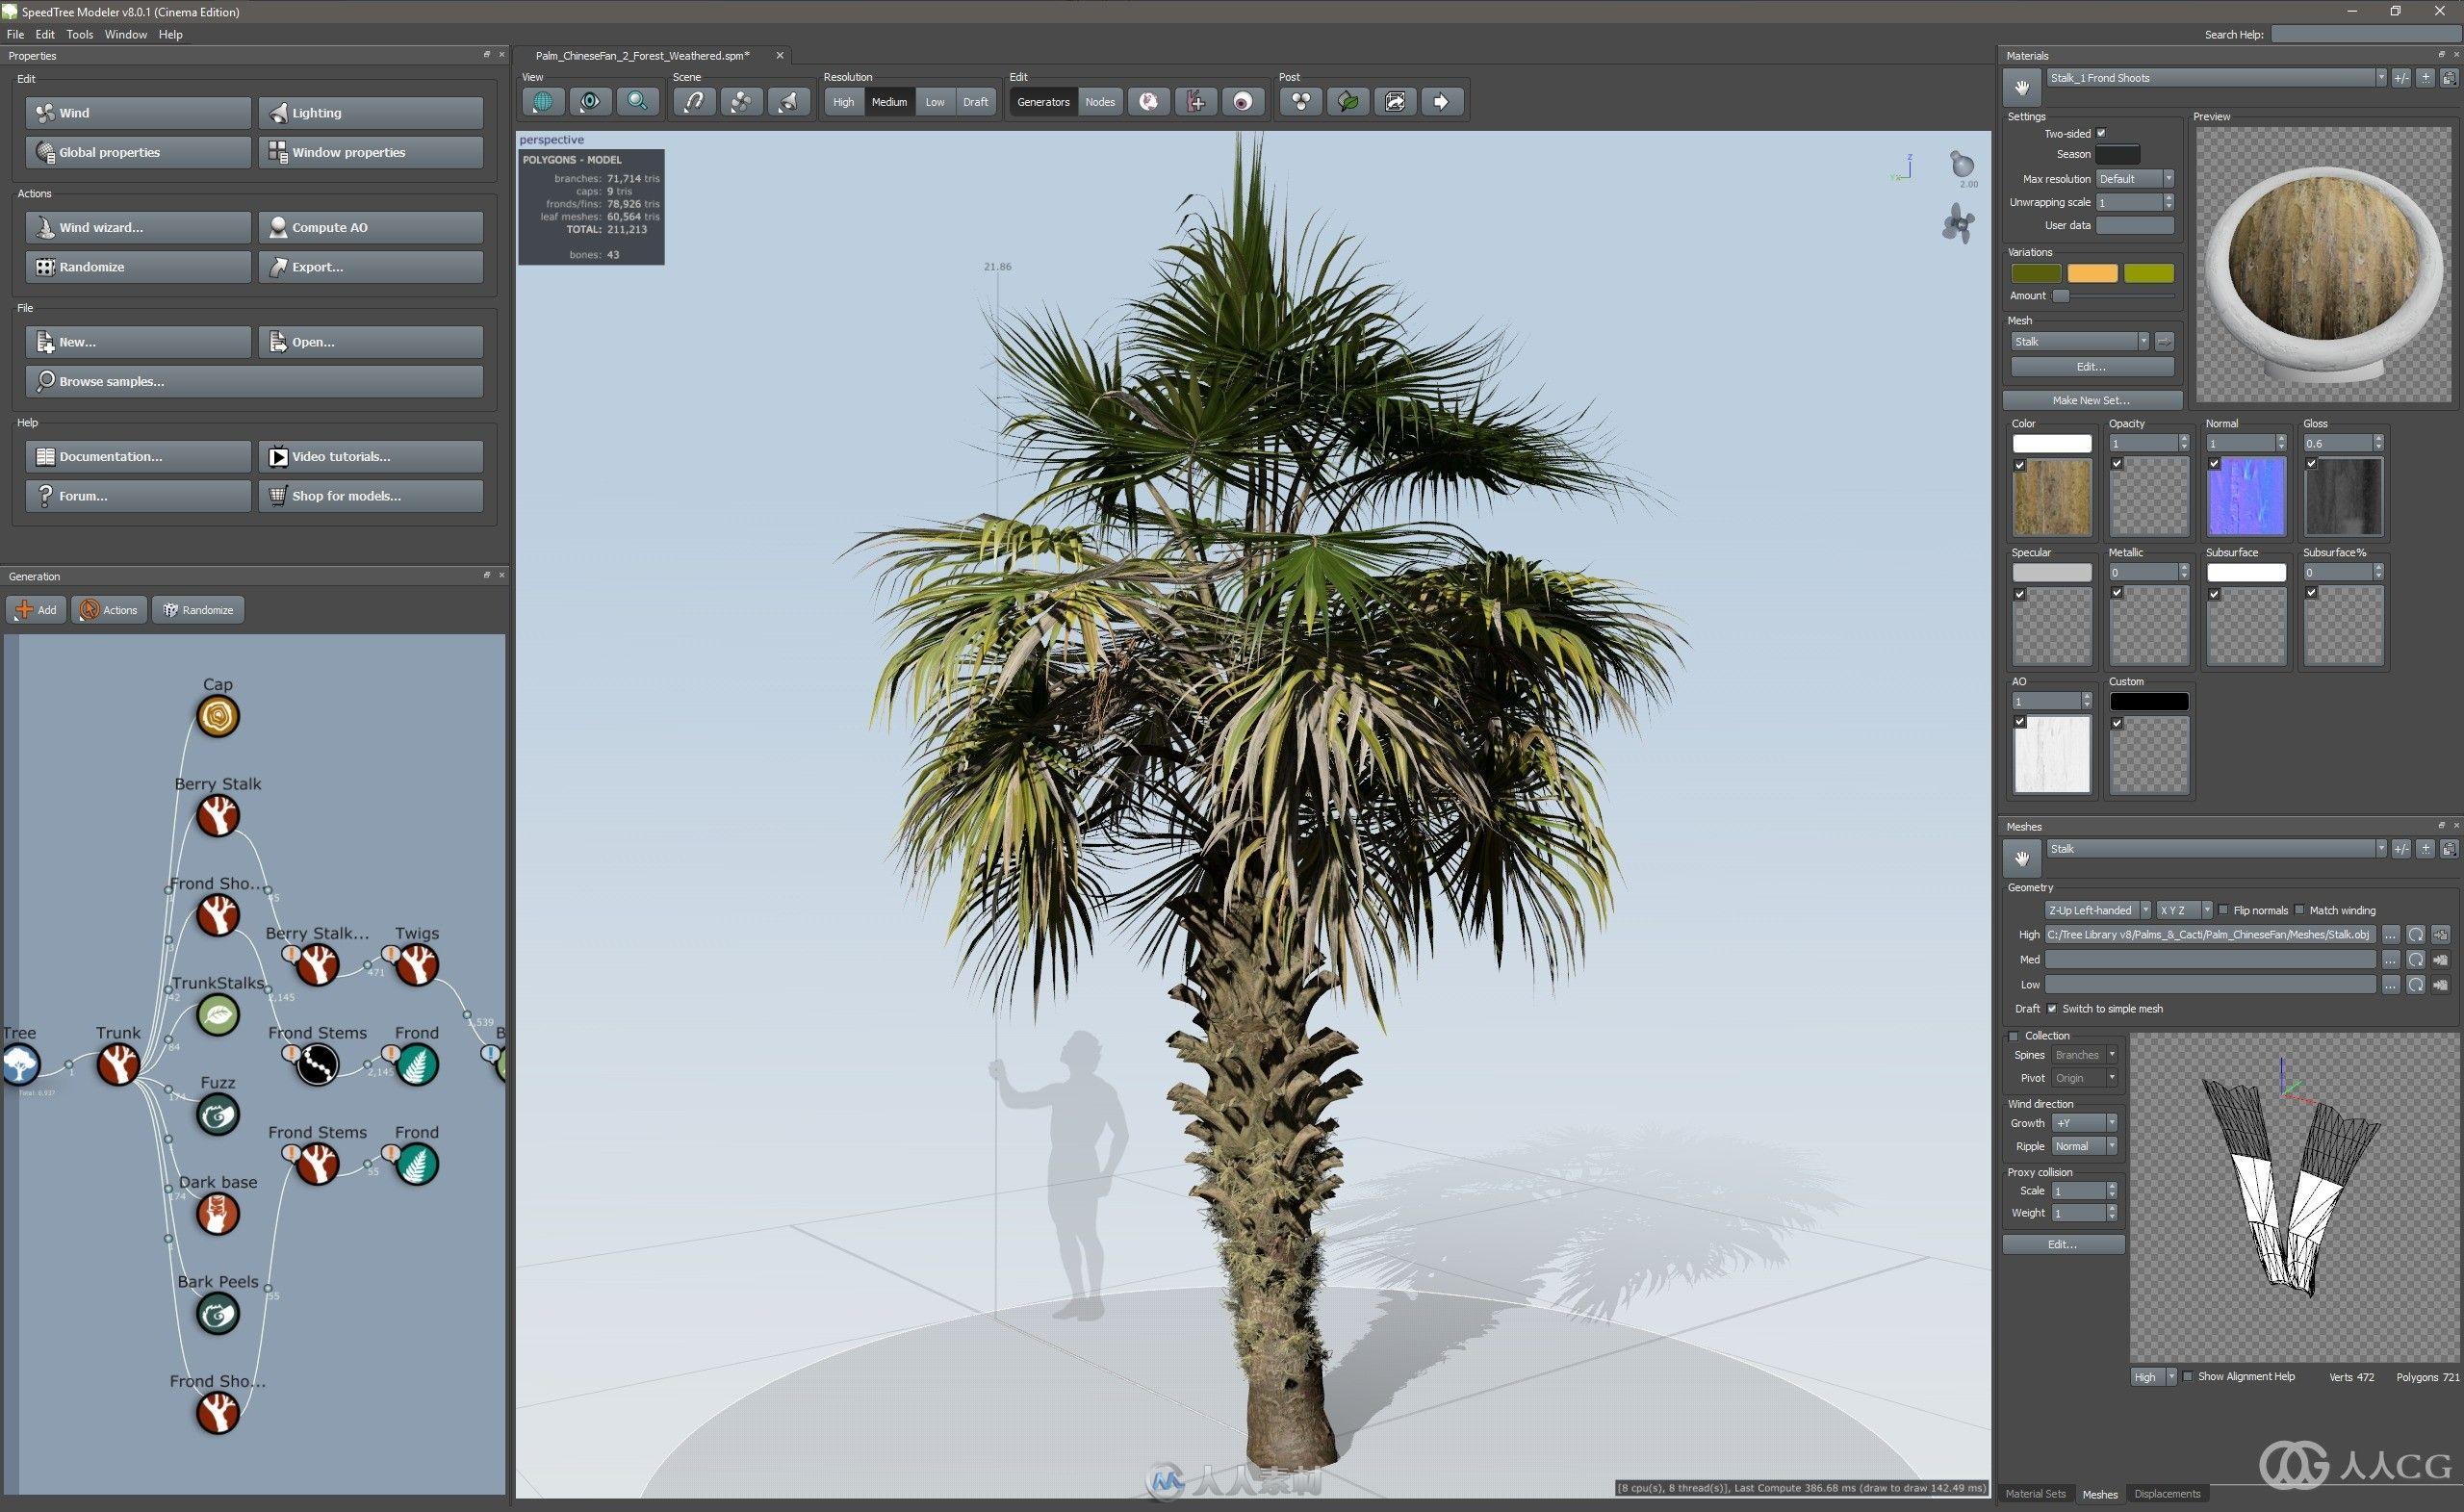 SpeedTree Cinema树木植物实时建模软件V8.1.5版77 / 作者:抱着猫的老鼠 / 帖子ID:16751156,5231612